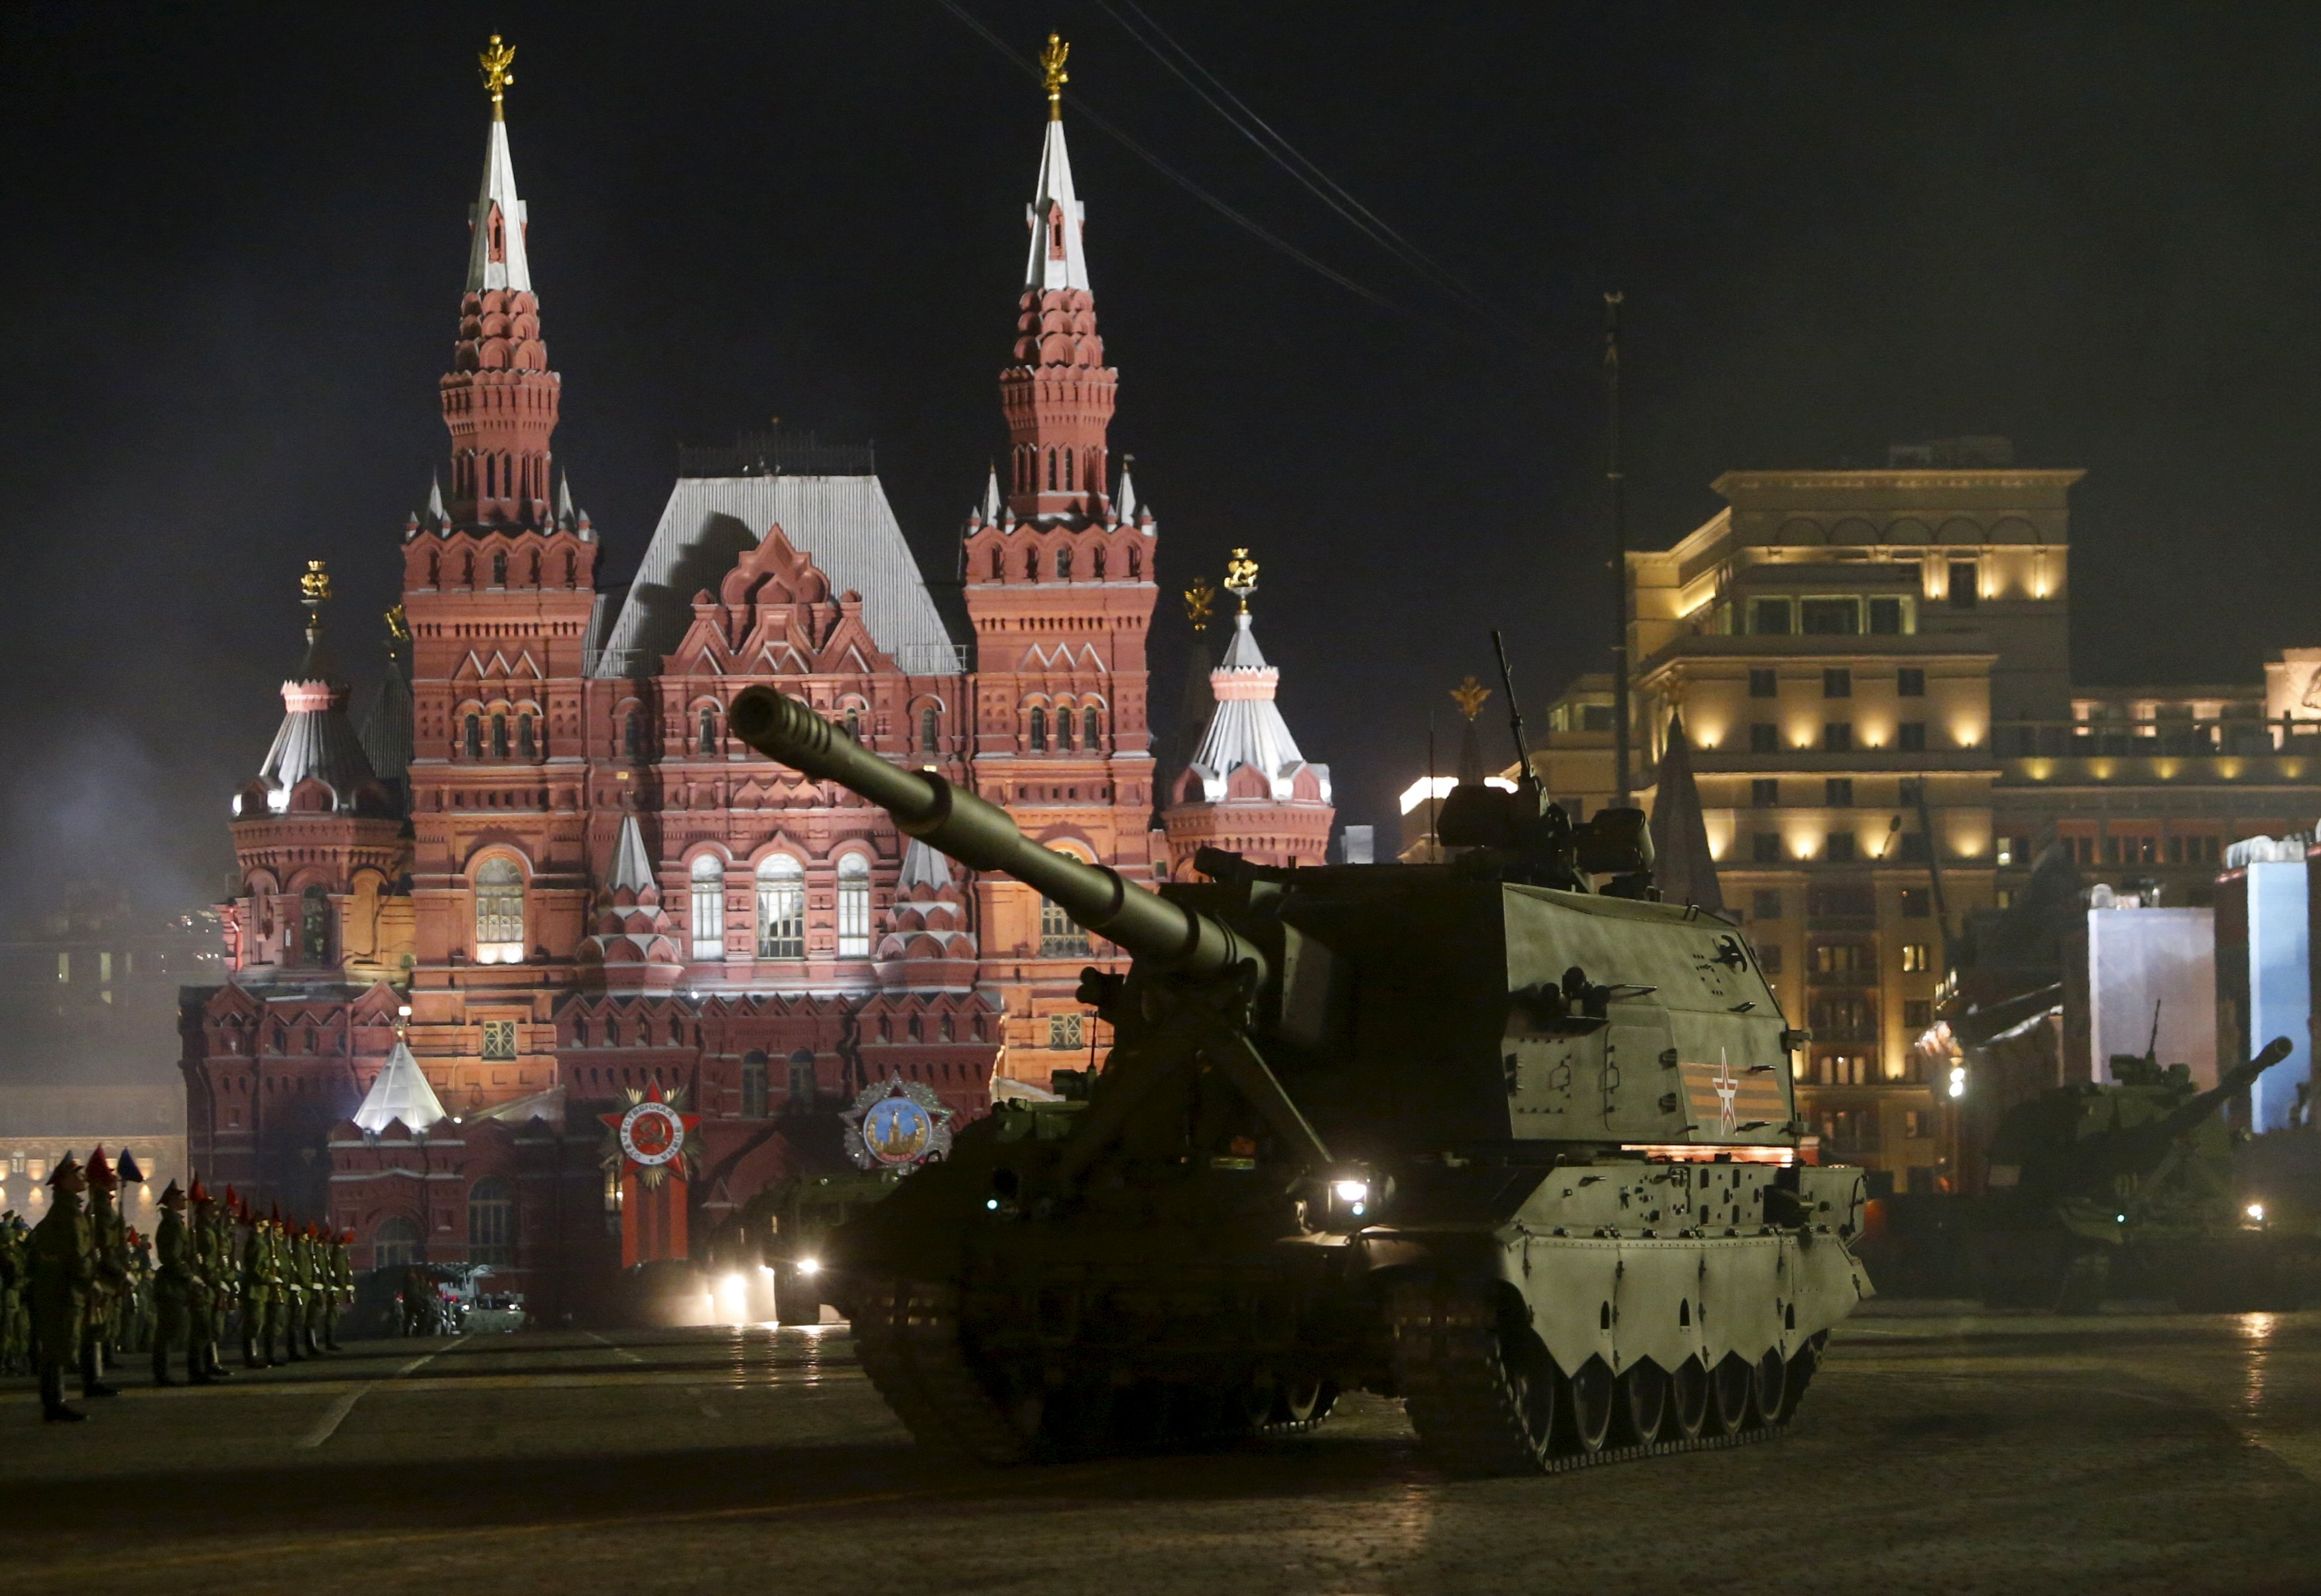 victory parade 2s35 spg 4 may 2015 giornata della vittoria russia howitzer self-propelled